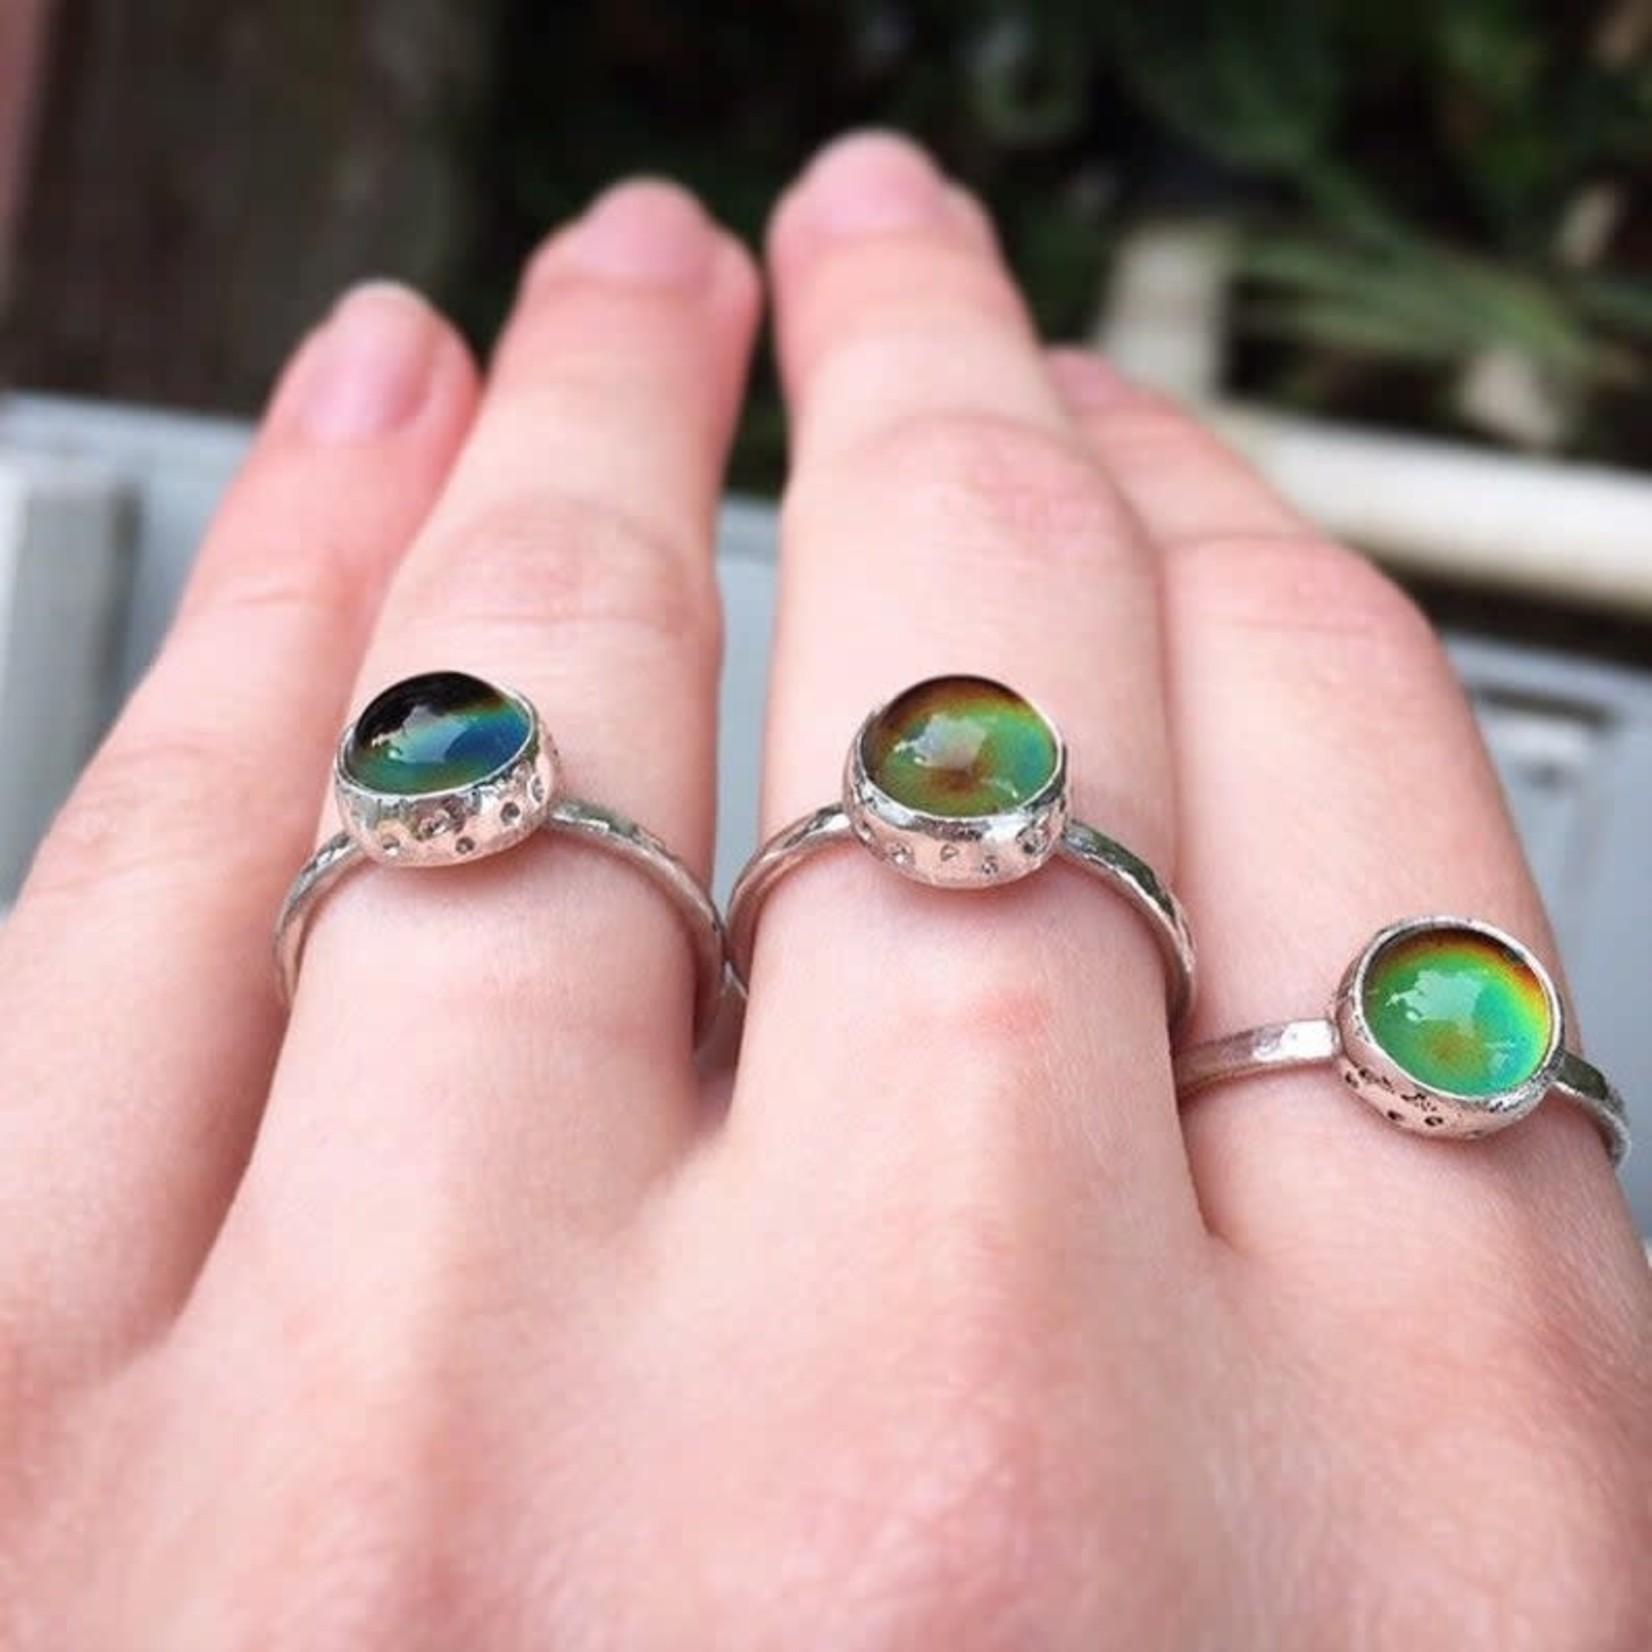 Handmade Silver Mood Ring